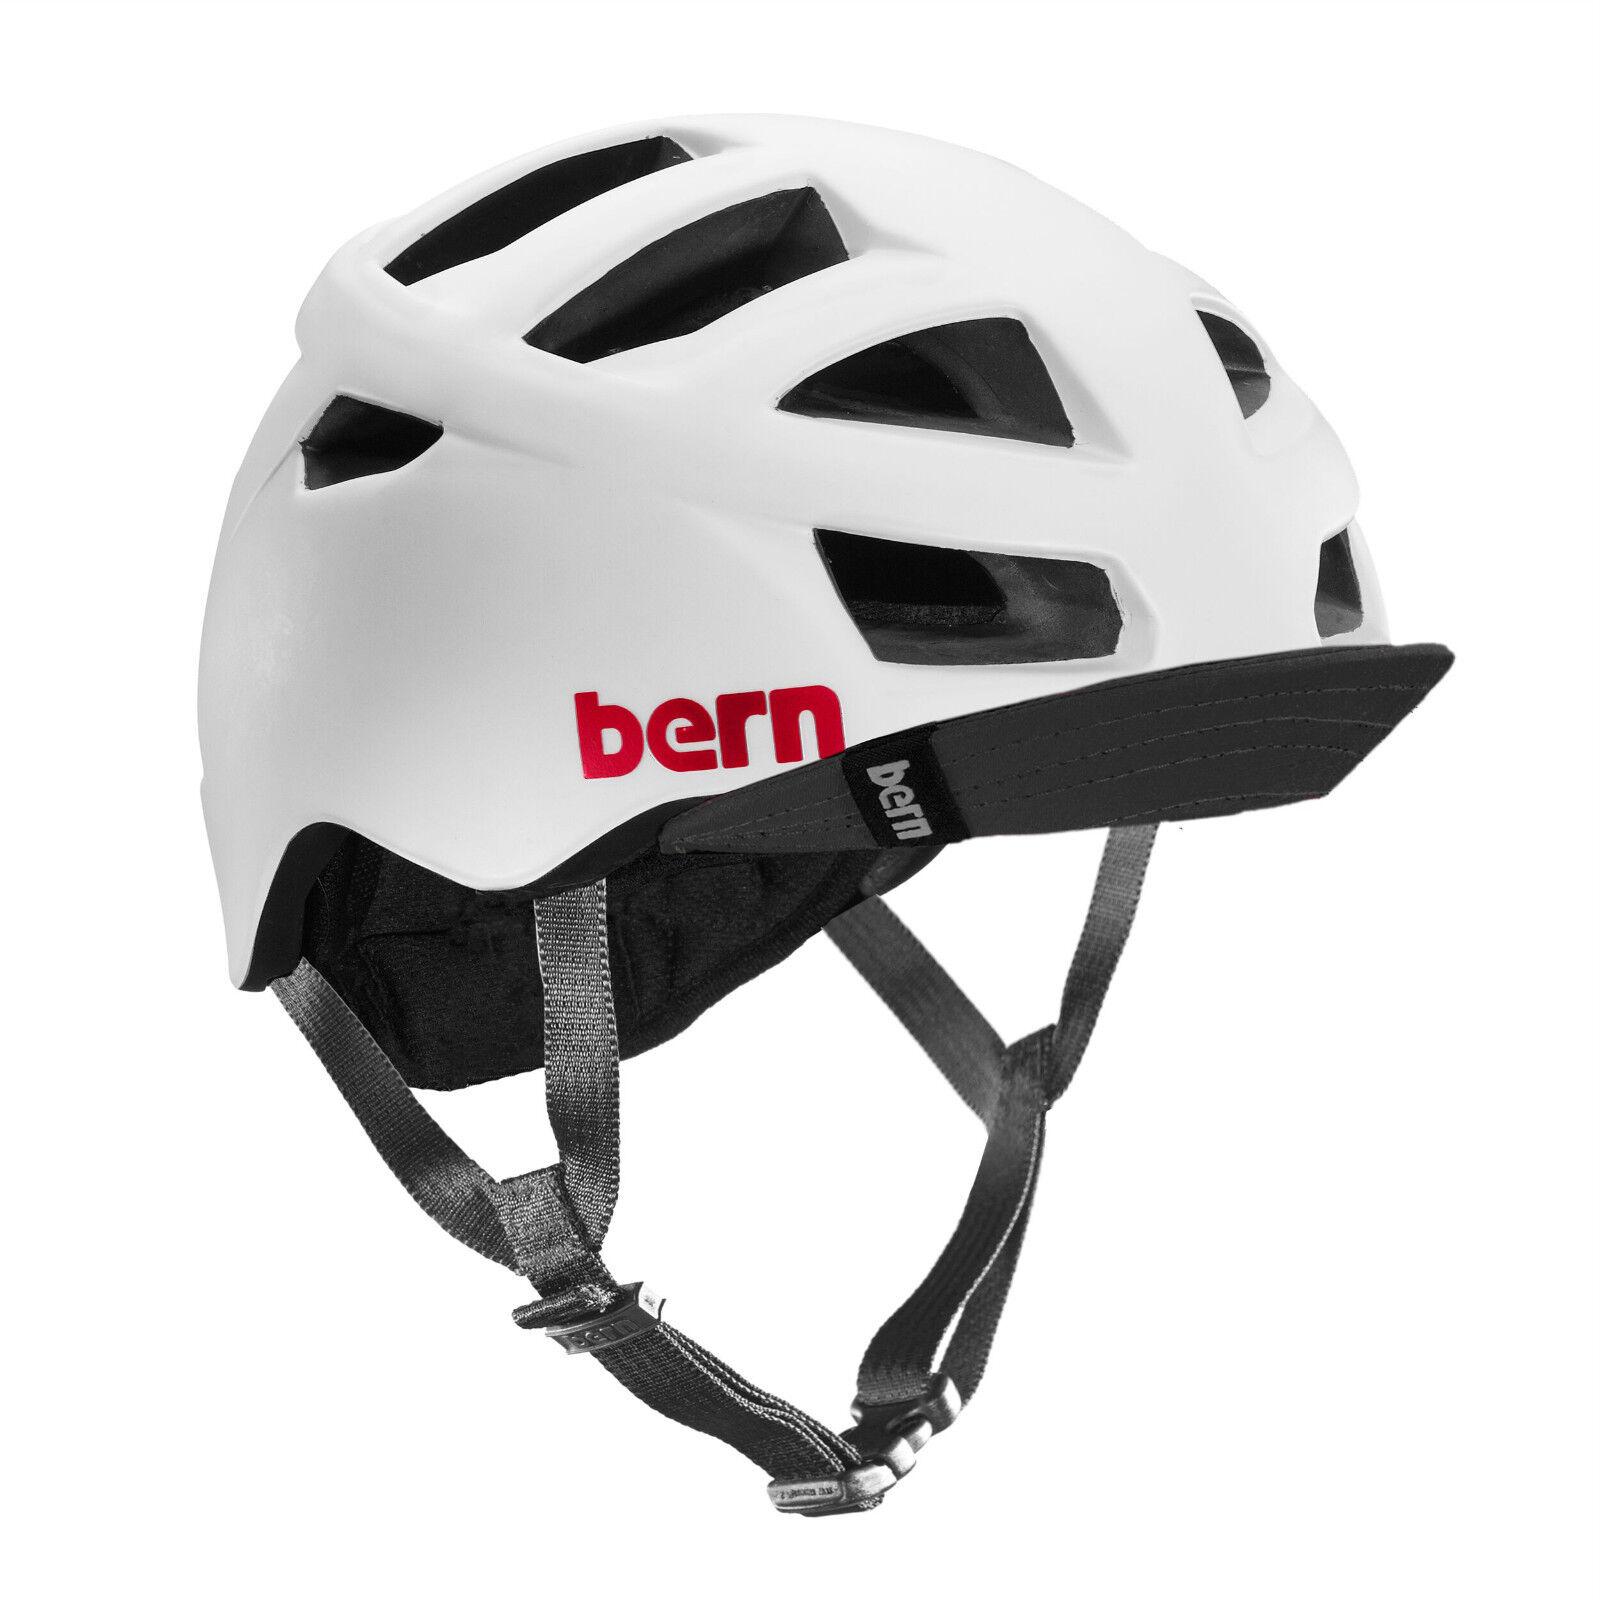 Bern Allston Zipmold Bicicletta Boa Casco Bianco Satinato SM LXL XXLXXXL